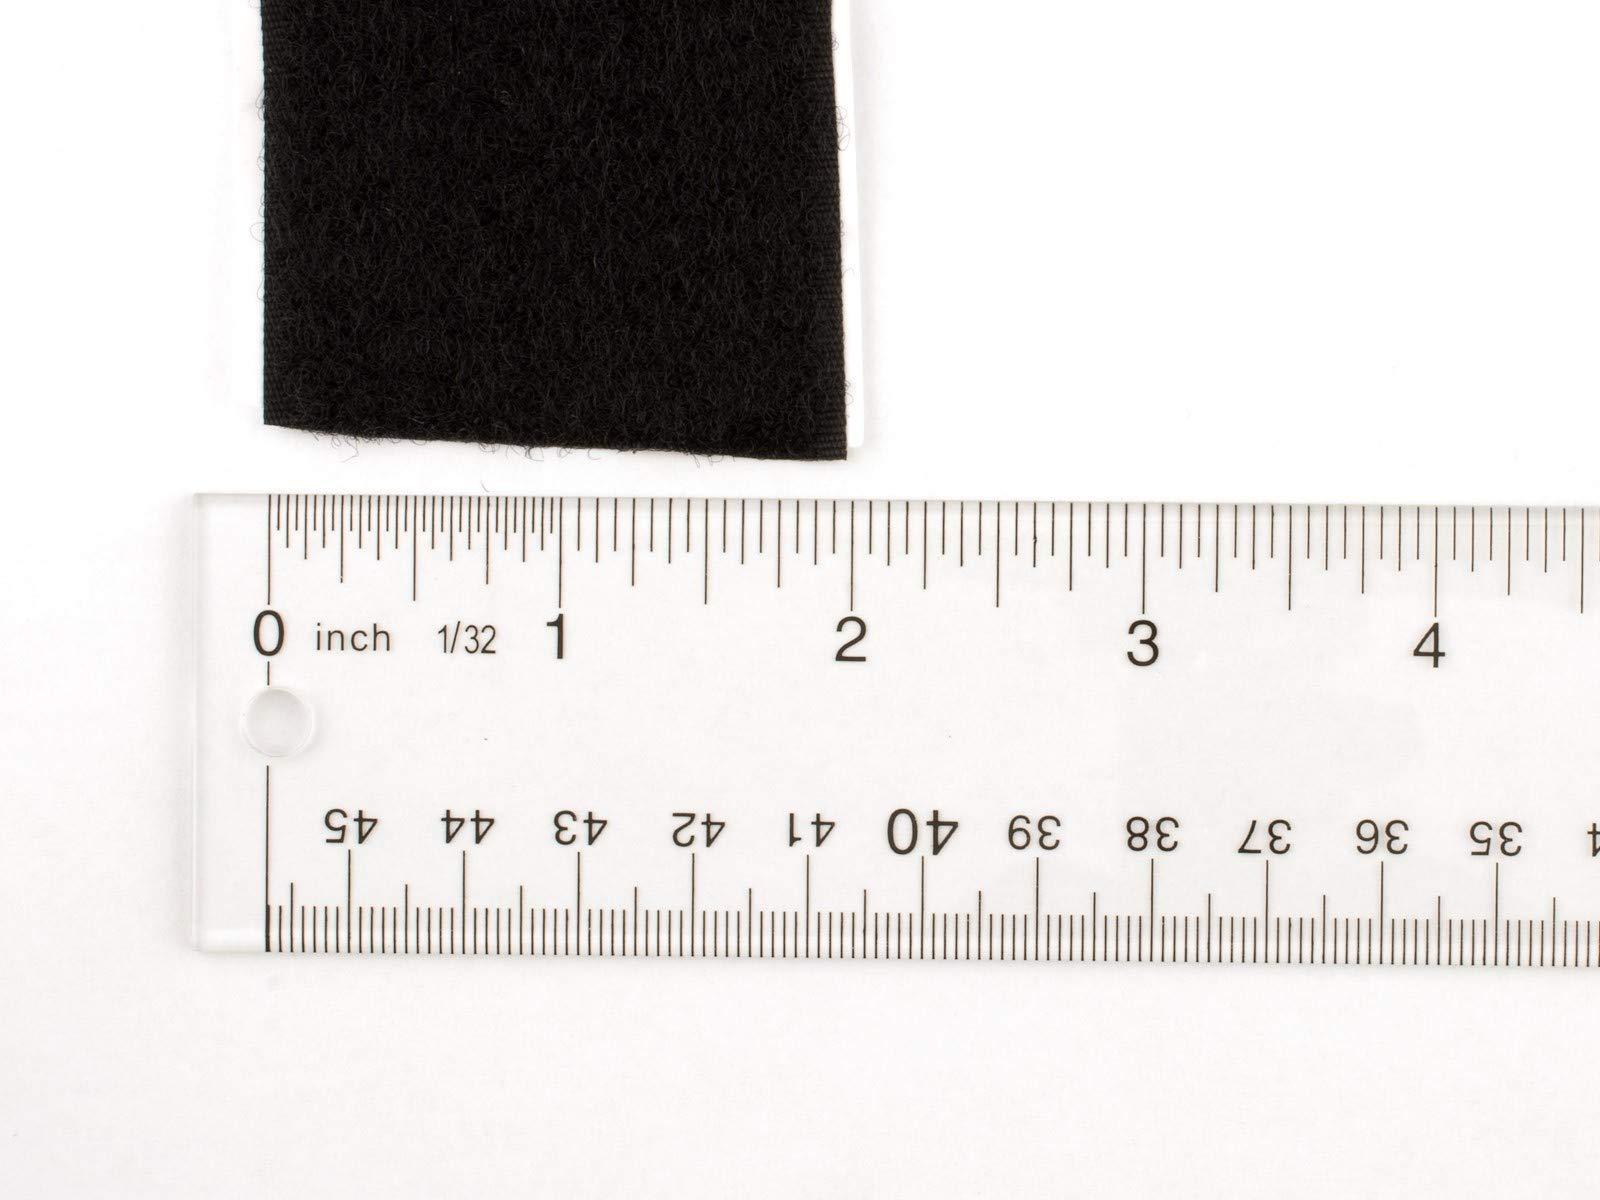 2 Inch White Self-Adhesive Hook and Loop - 5 Yards